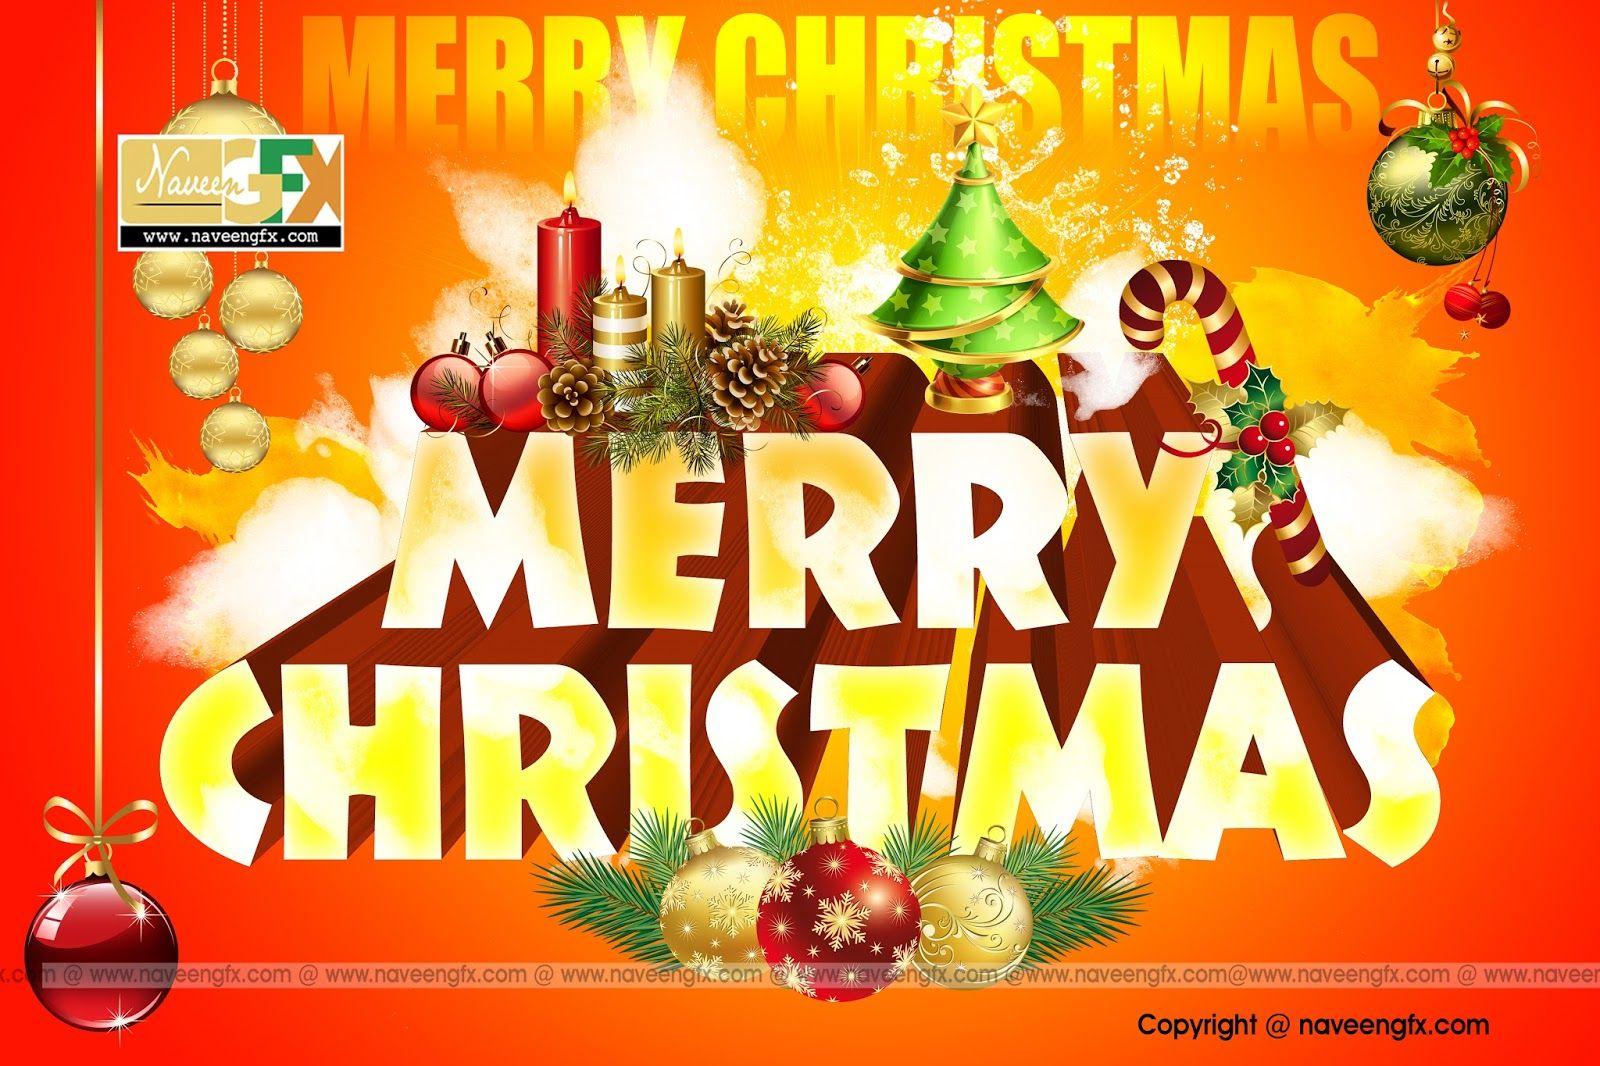 Christmas photo cards psd christmas psd greetings messagemerry christmas photo cards psd christmas psd greetings messagemerry xmas greetings psd background free m4hsunfo